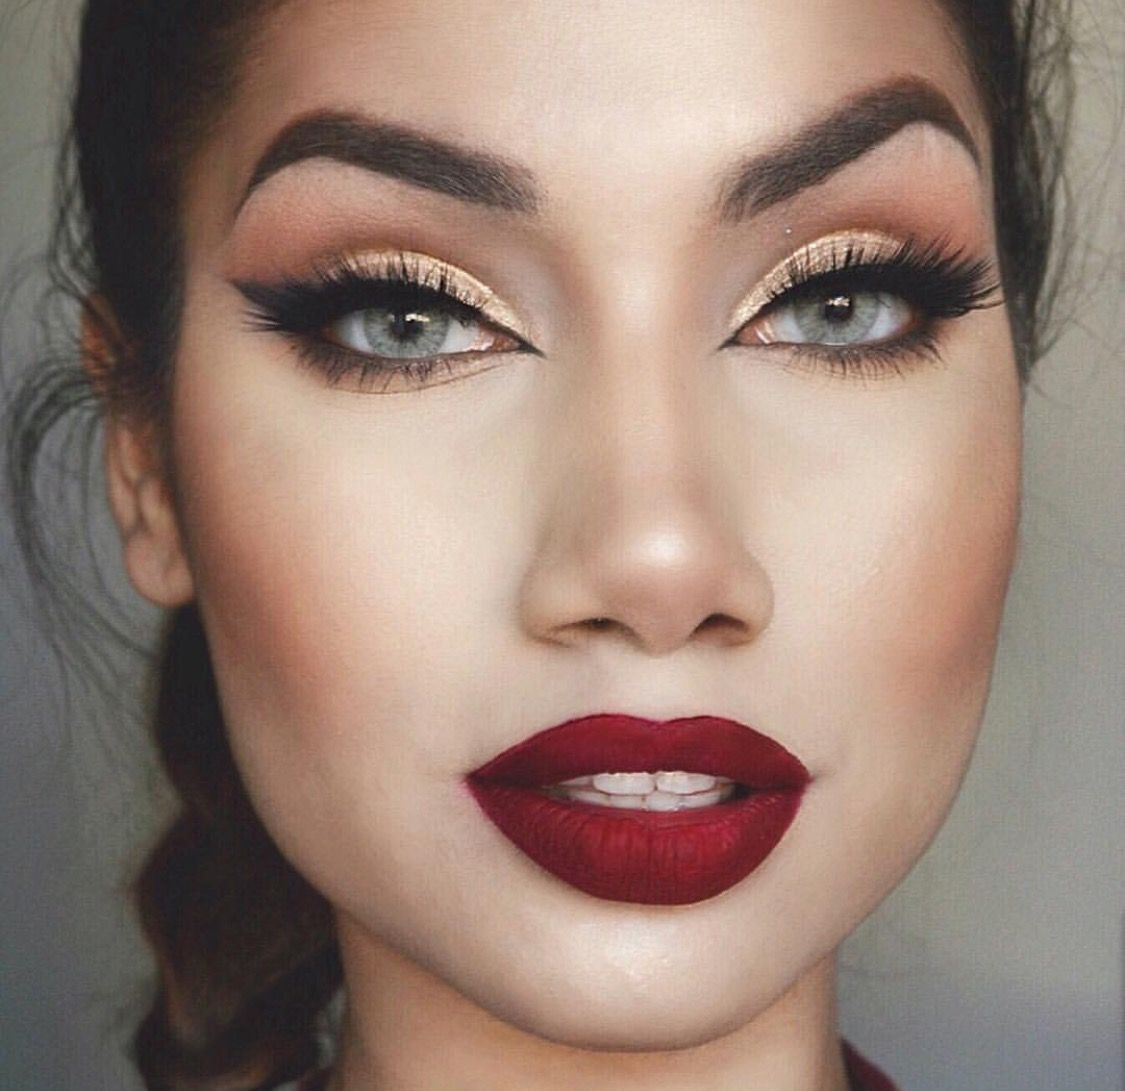 23 Christmas Makeup Ideas to Copy This Season